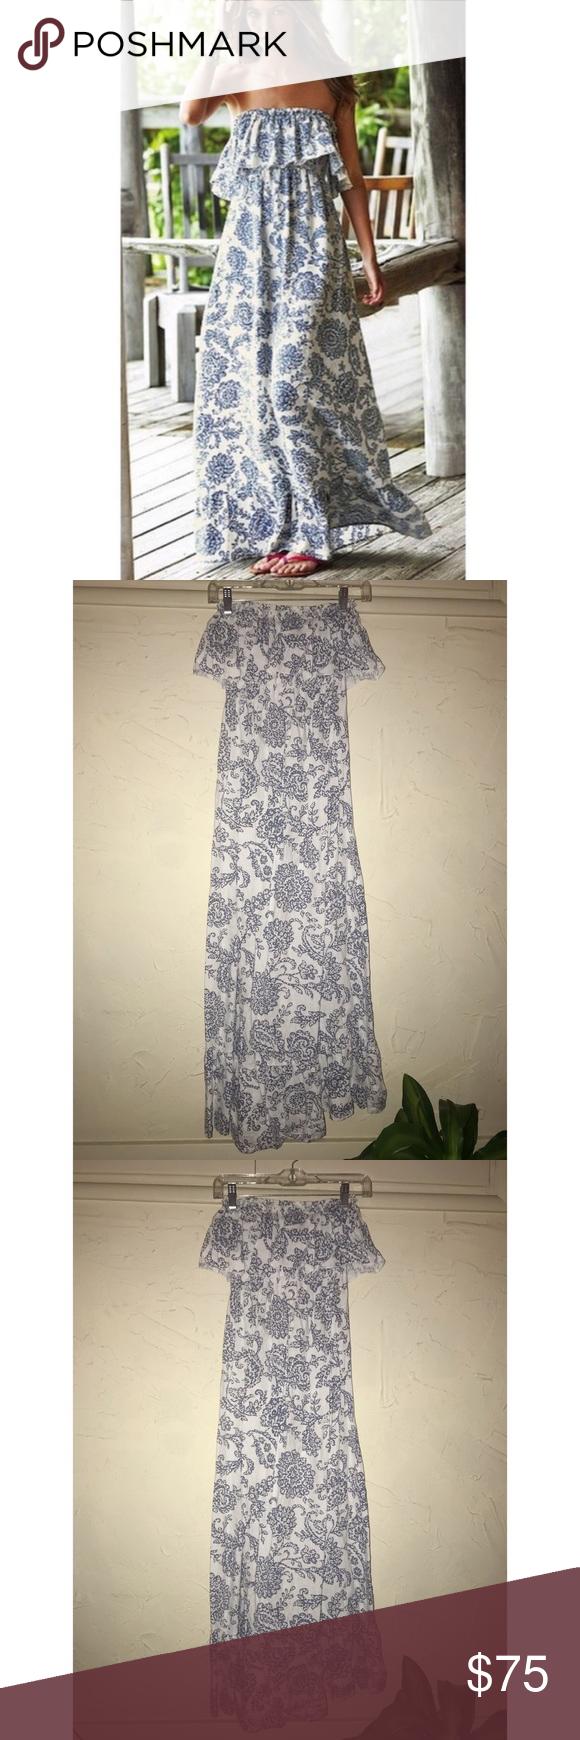 Victoria S Secret Blue White Maxi Dress Blue White Maxi Dress White Maxi Dresses White Maxi [ 1740 x 580 Pixel ]